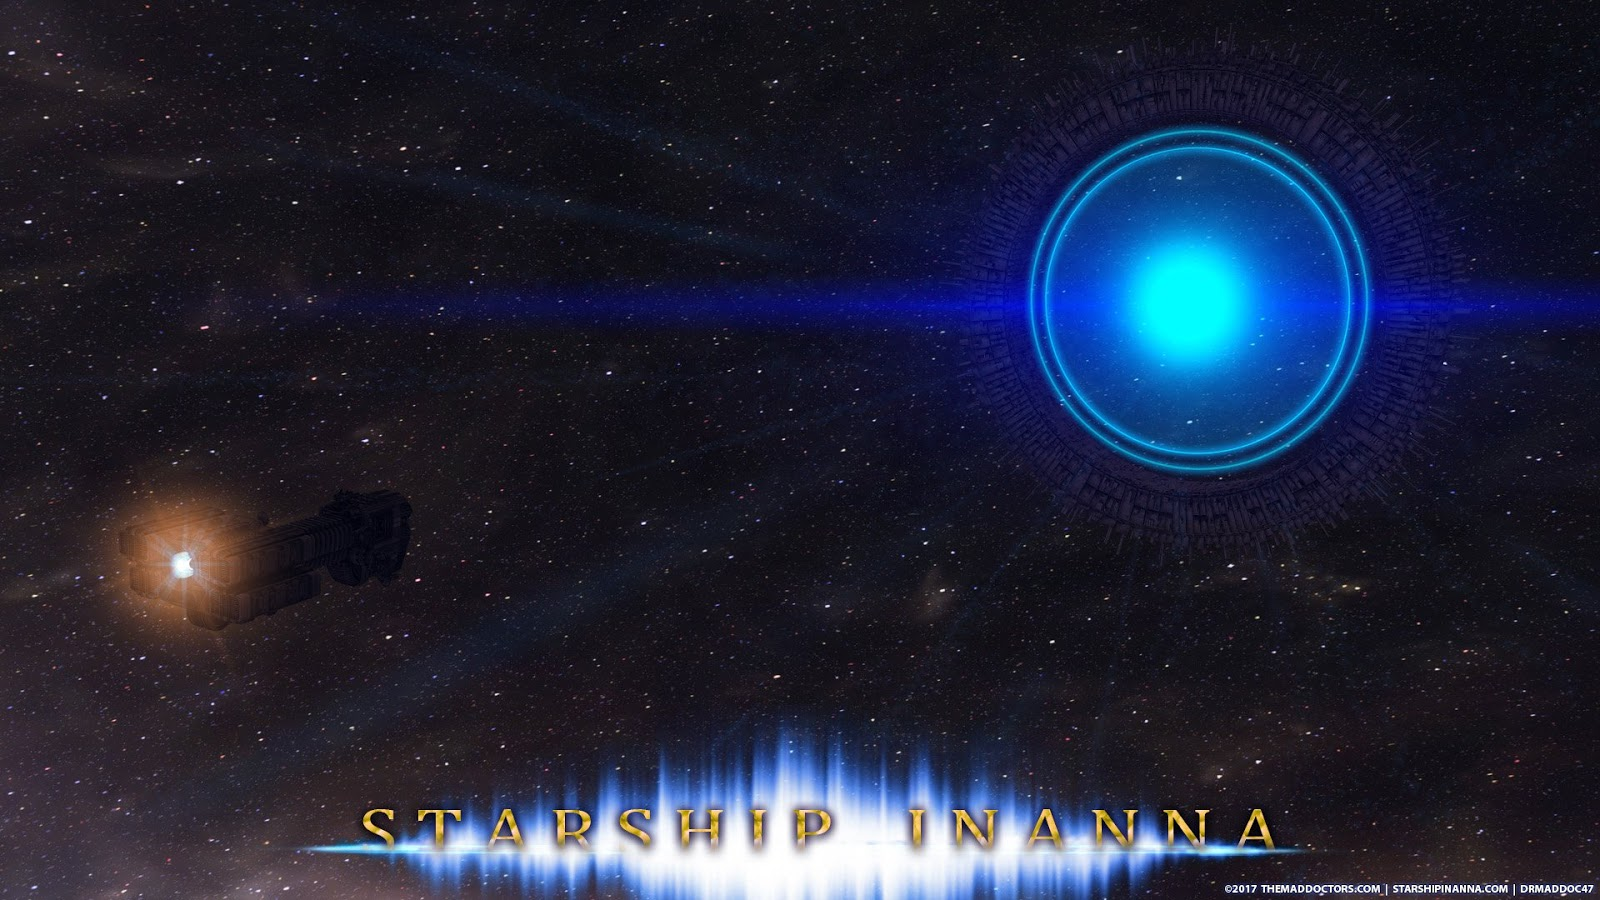 Starship Inanna EP4 android port